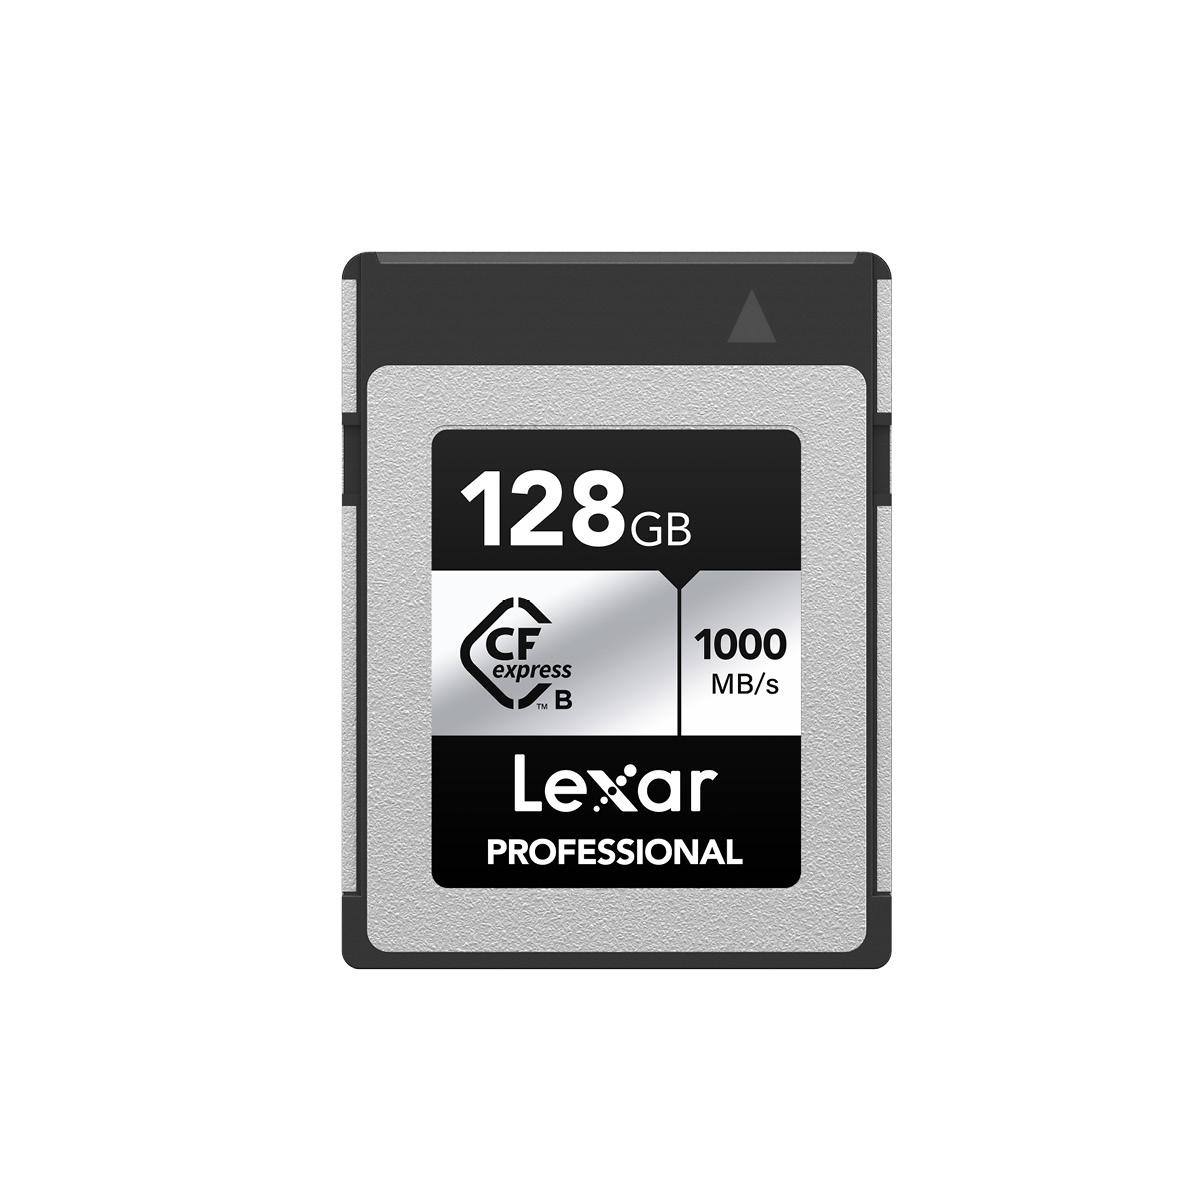 Lexar 128 GB CFexpress TYP-B 1000 MB/s